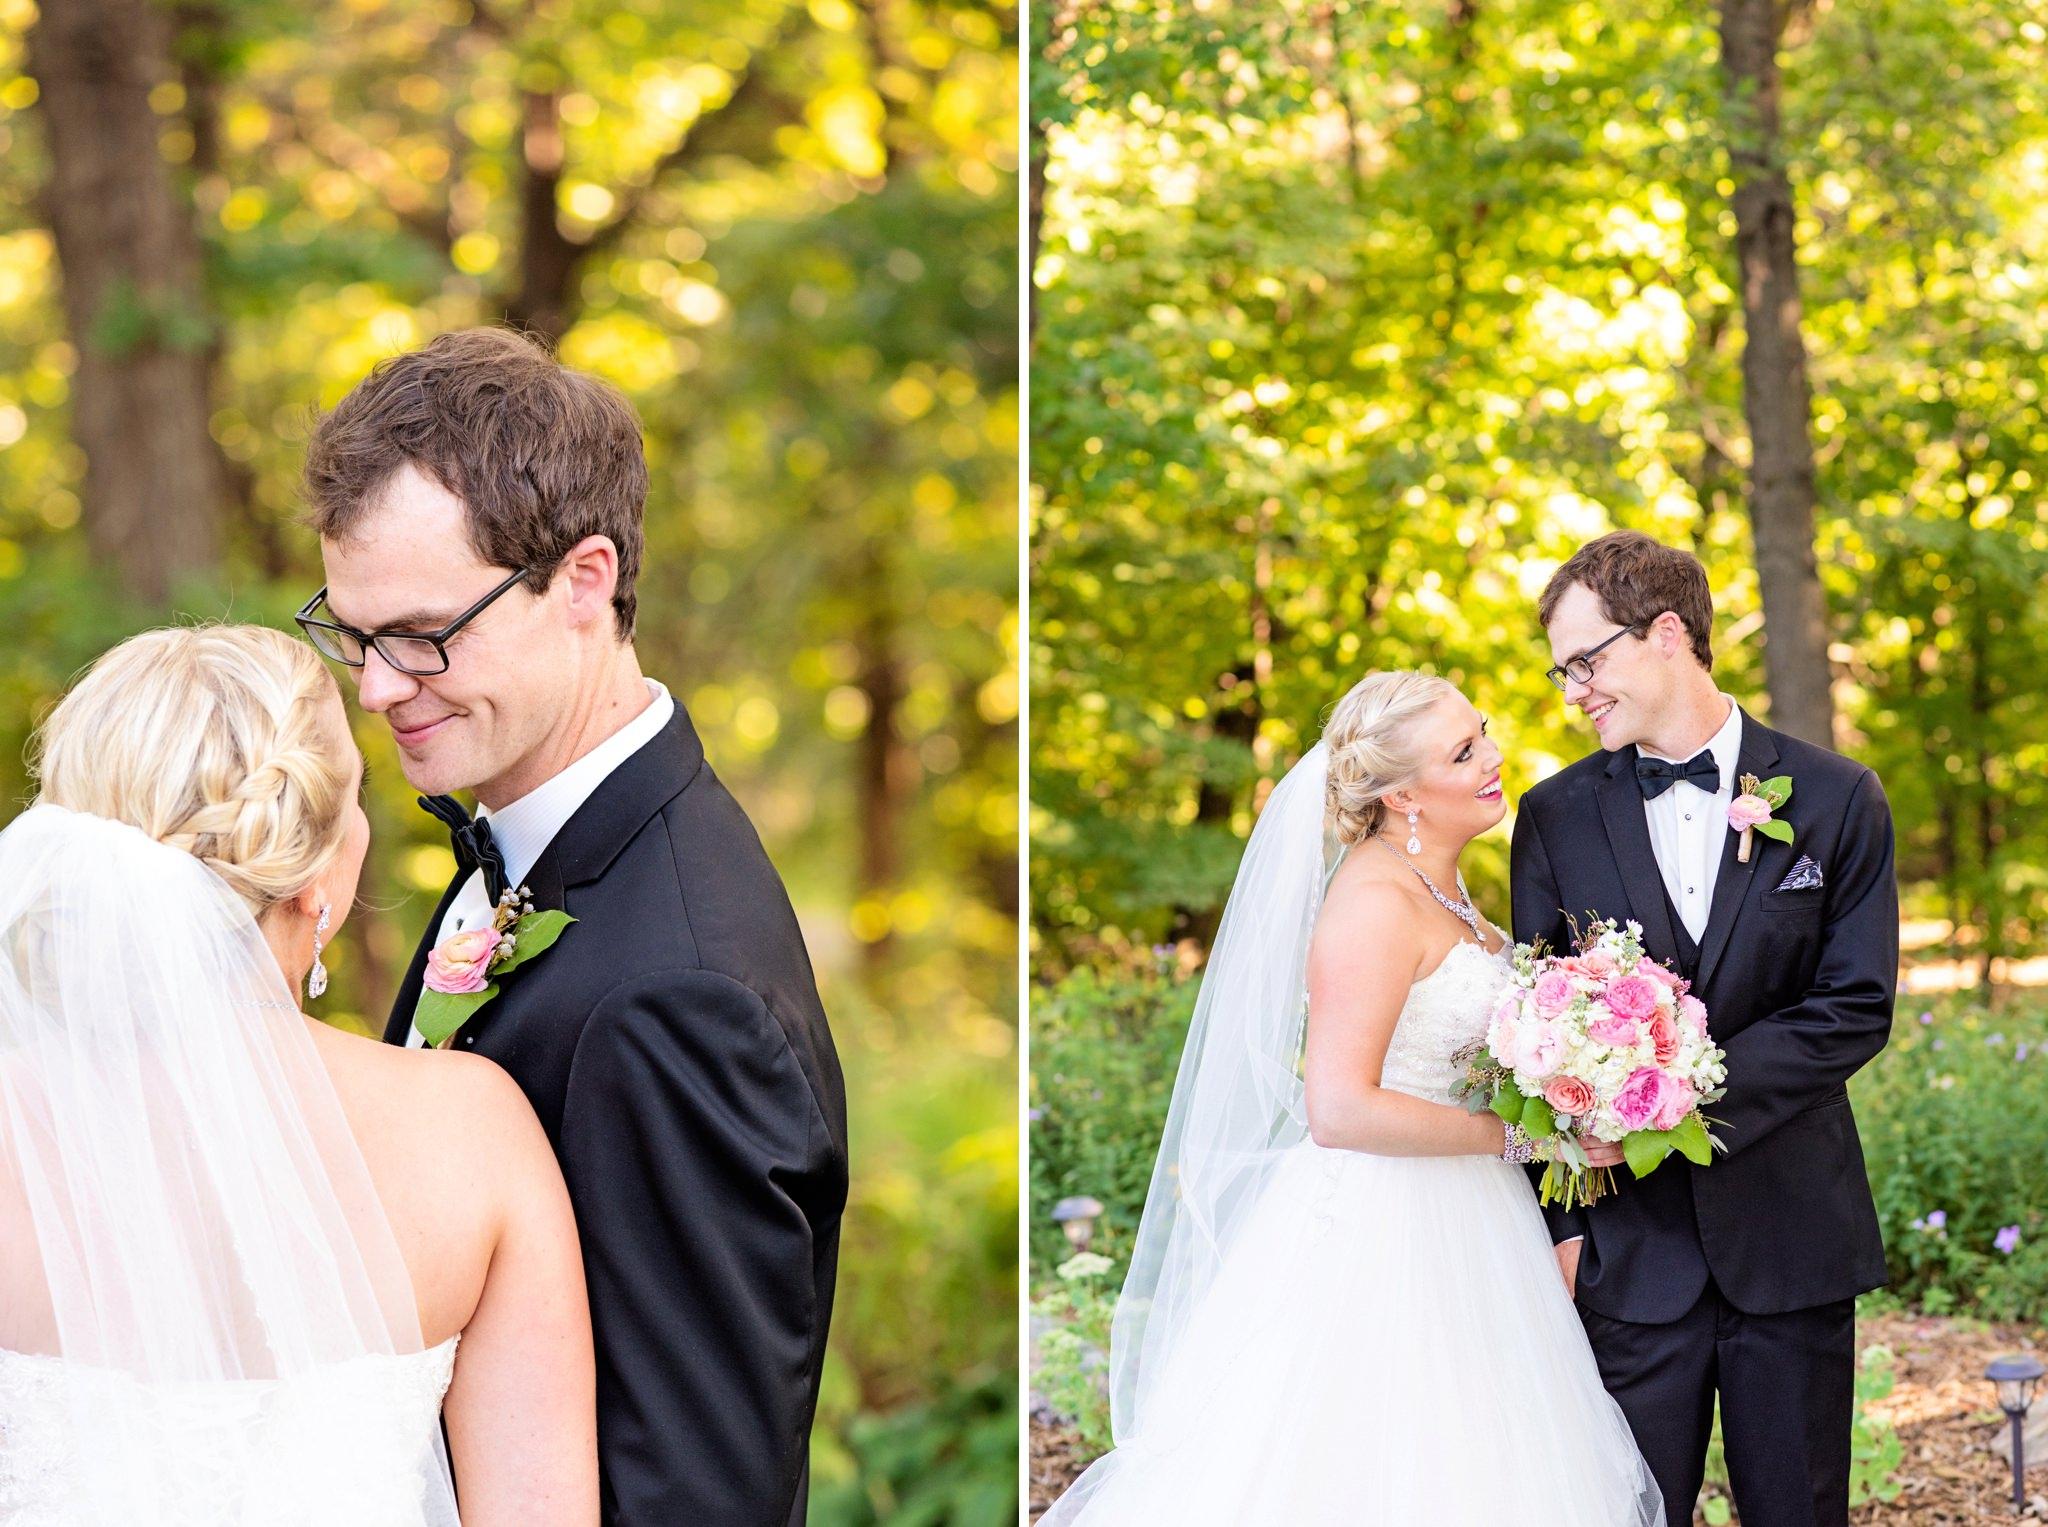 Brittany-Jay-Wedding-091518-Rotella-Photography-23_BLOG.jpg